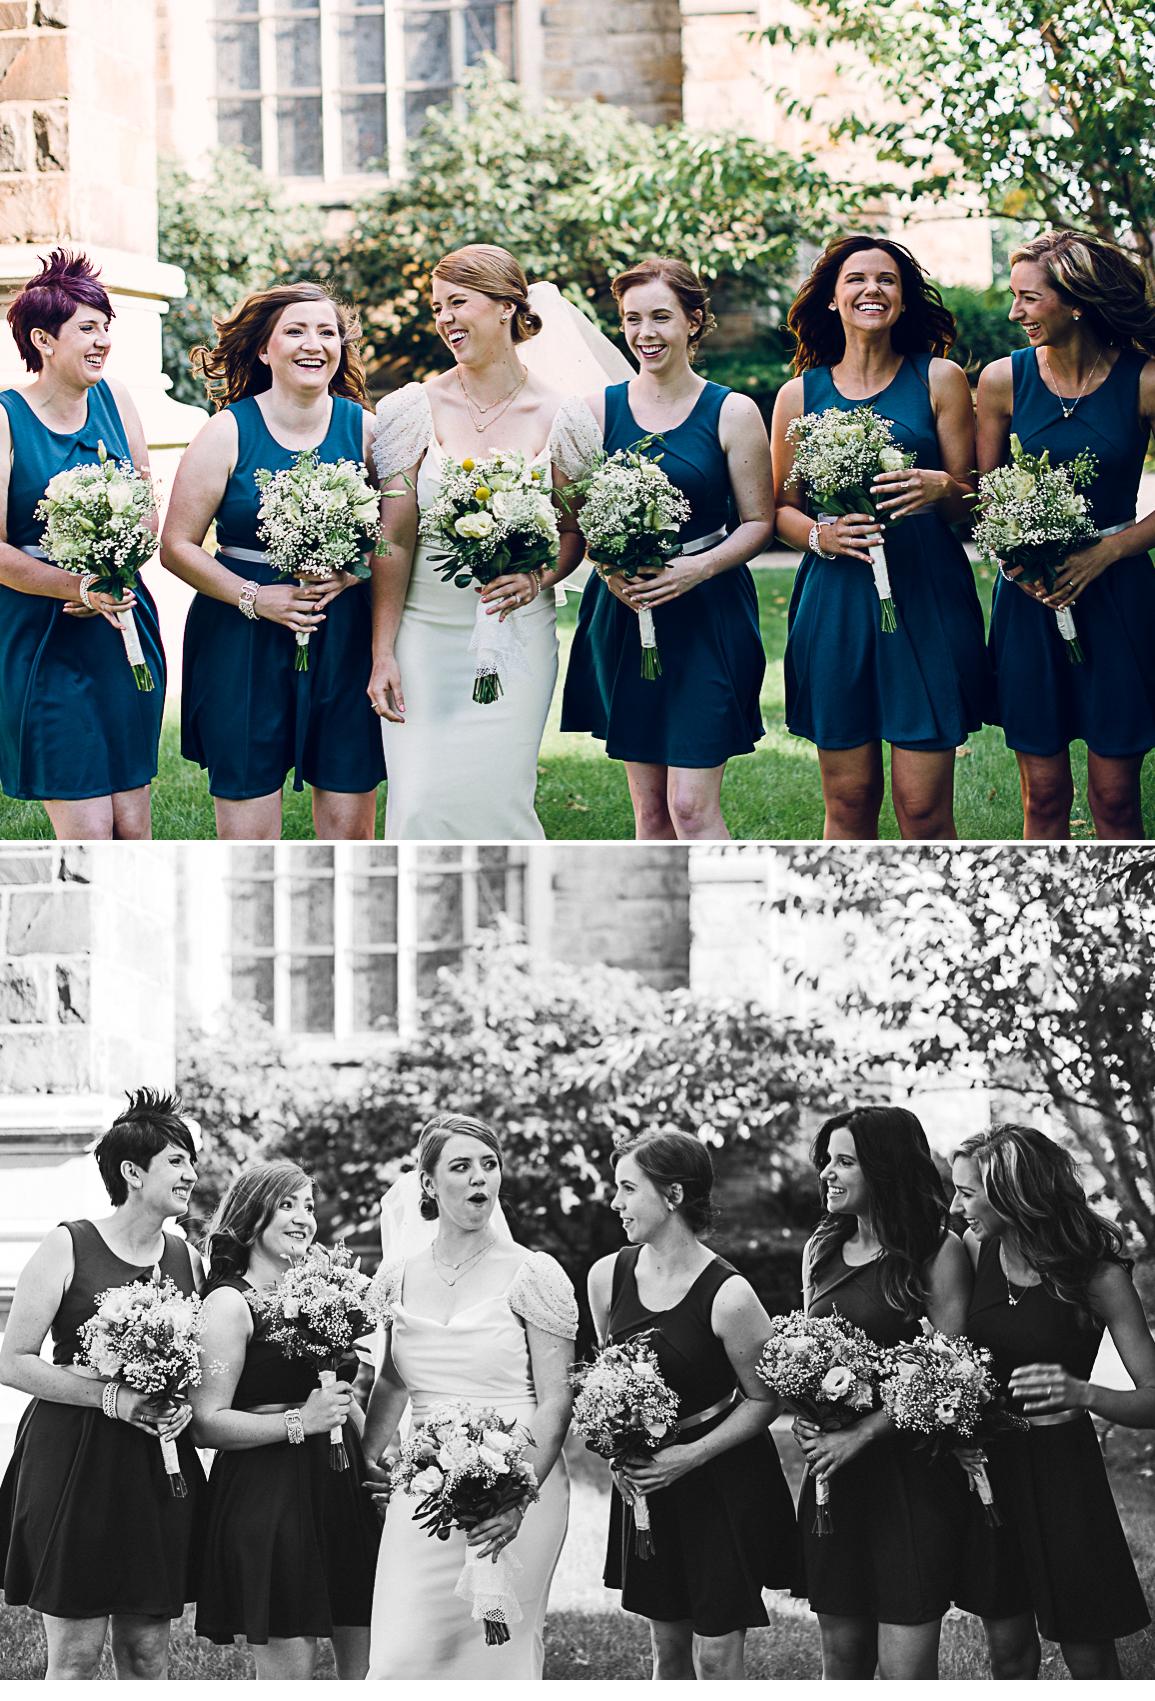 Laughing Bridesmaids